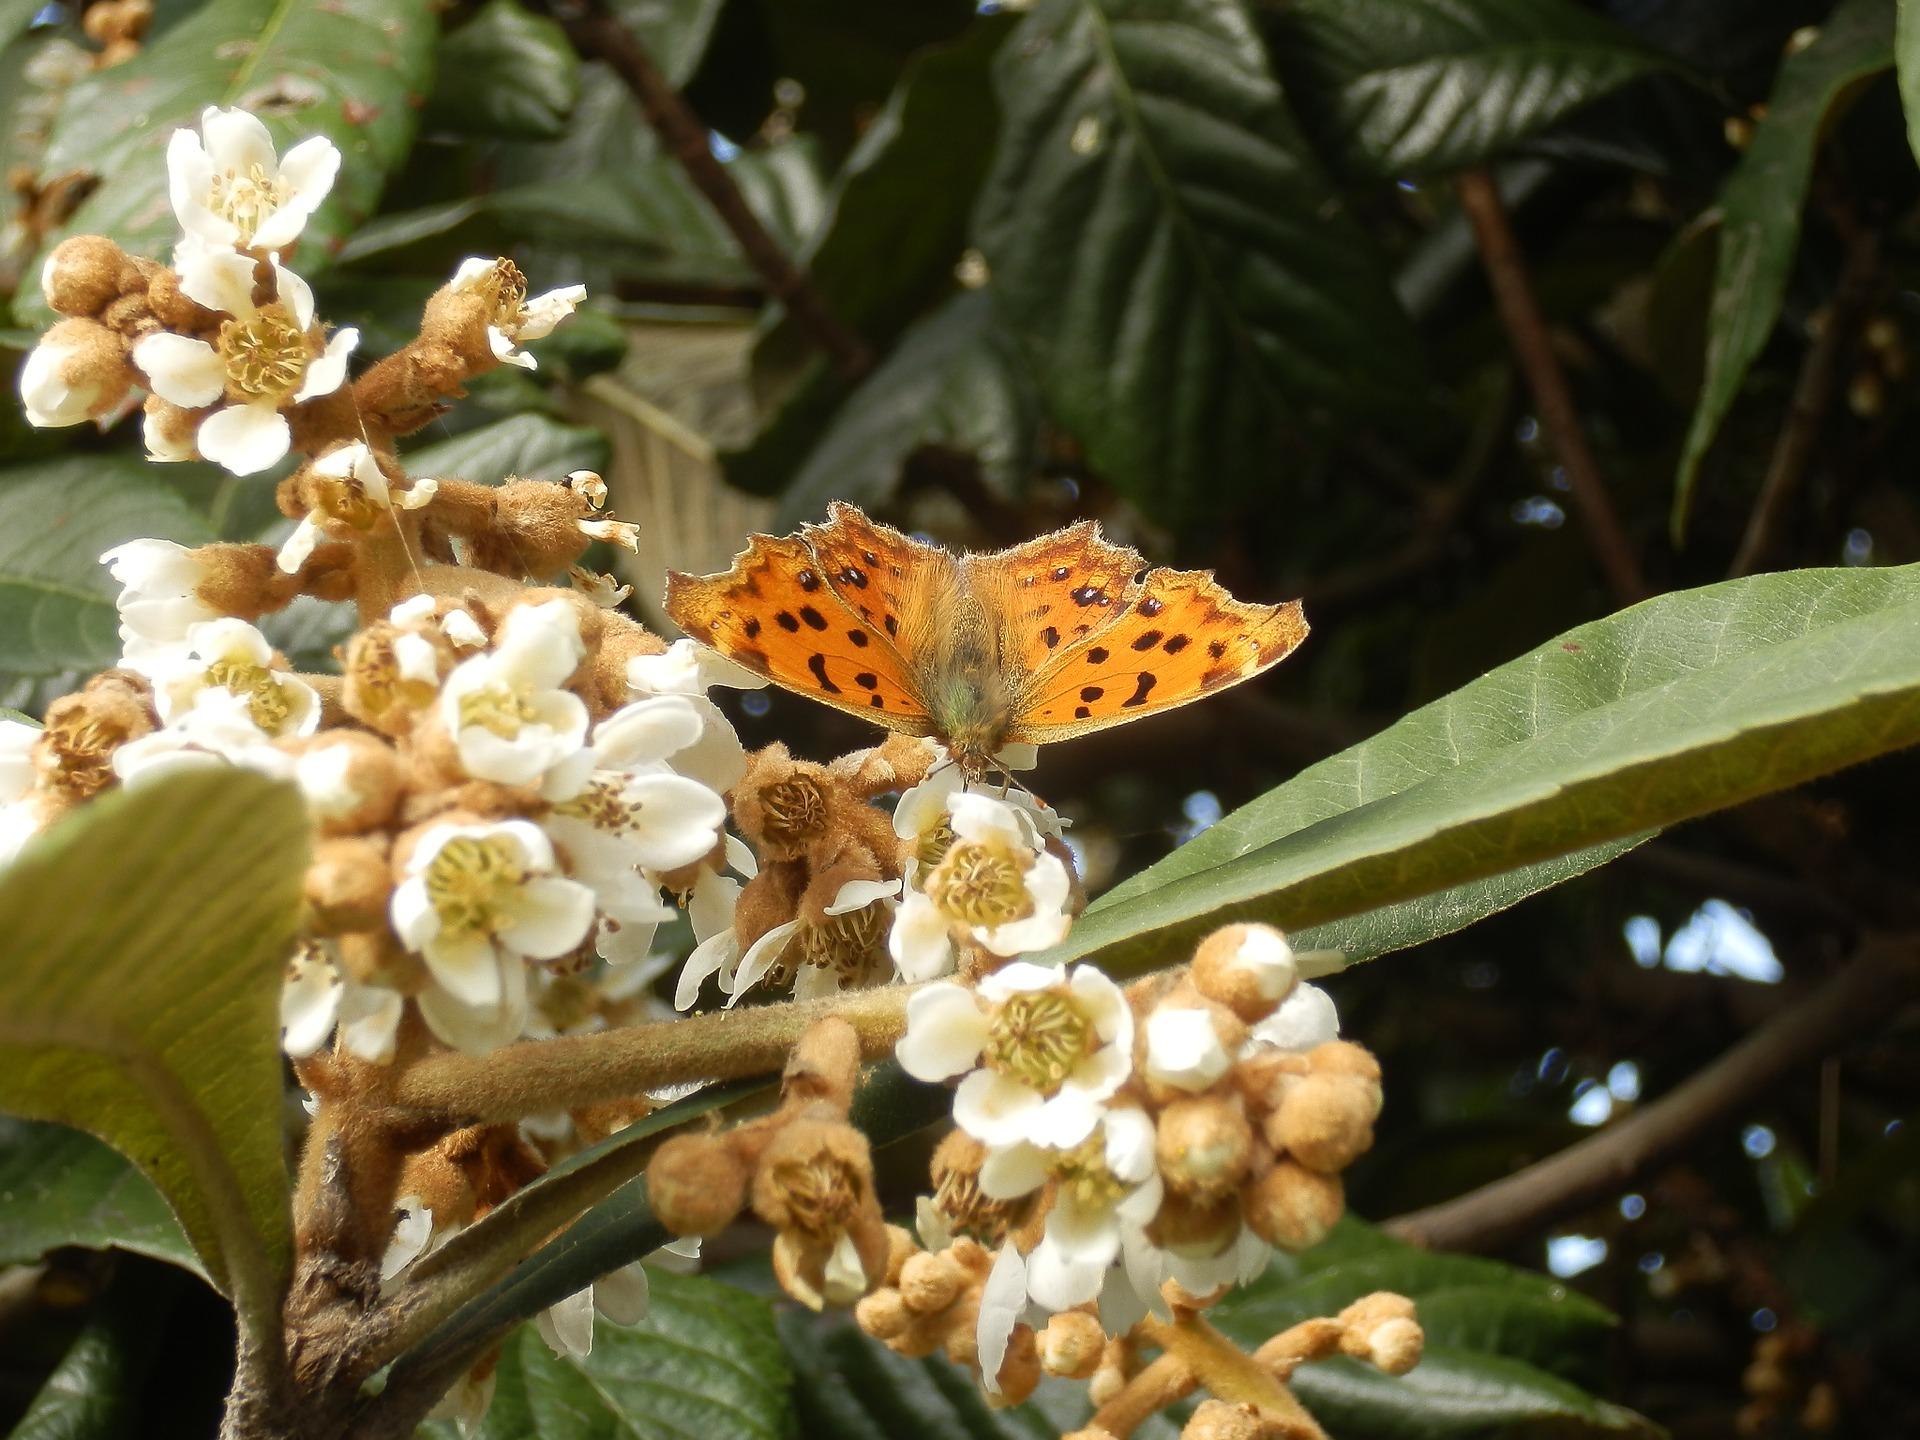 nymphalidae-1858495_1920 pixabay.jpg